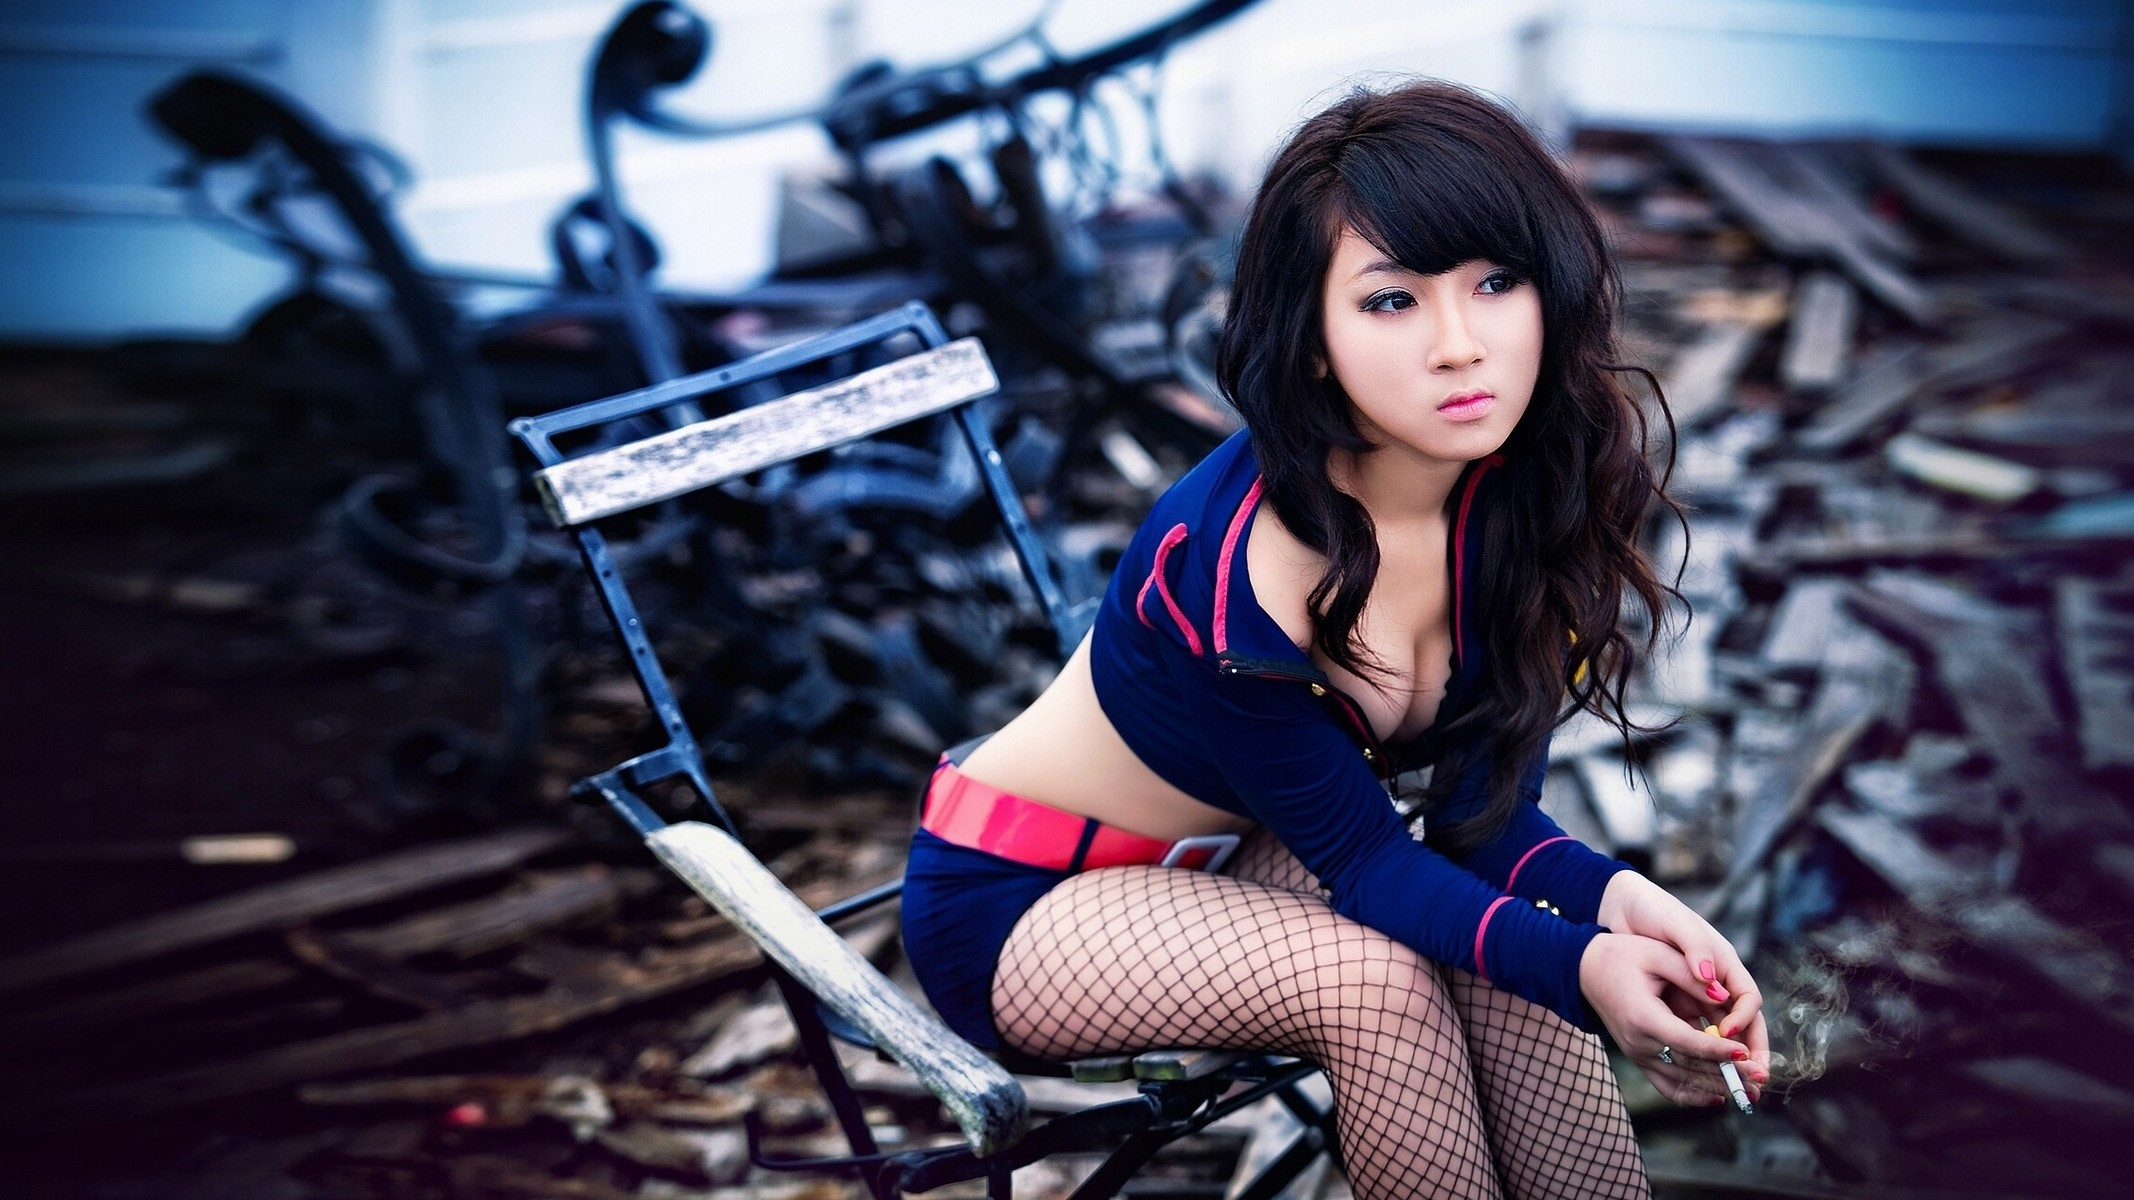 People 2134x1200 women Asian cosplay brunette wavy hair sitting chair looking away smoking fishnet